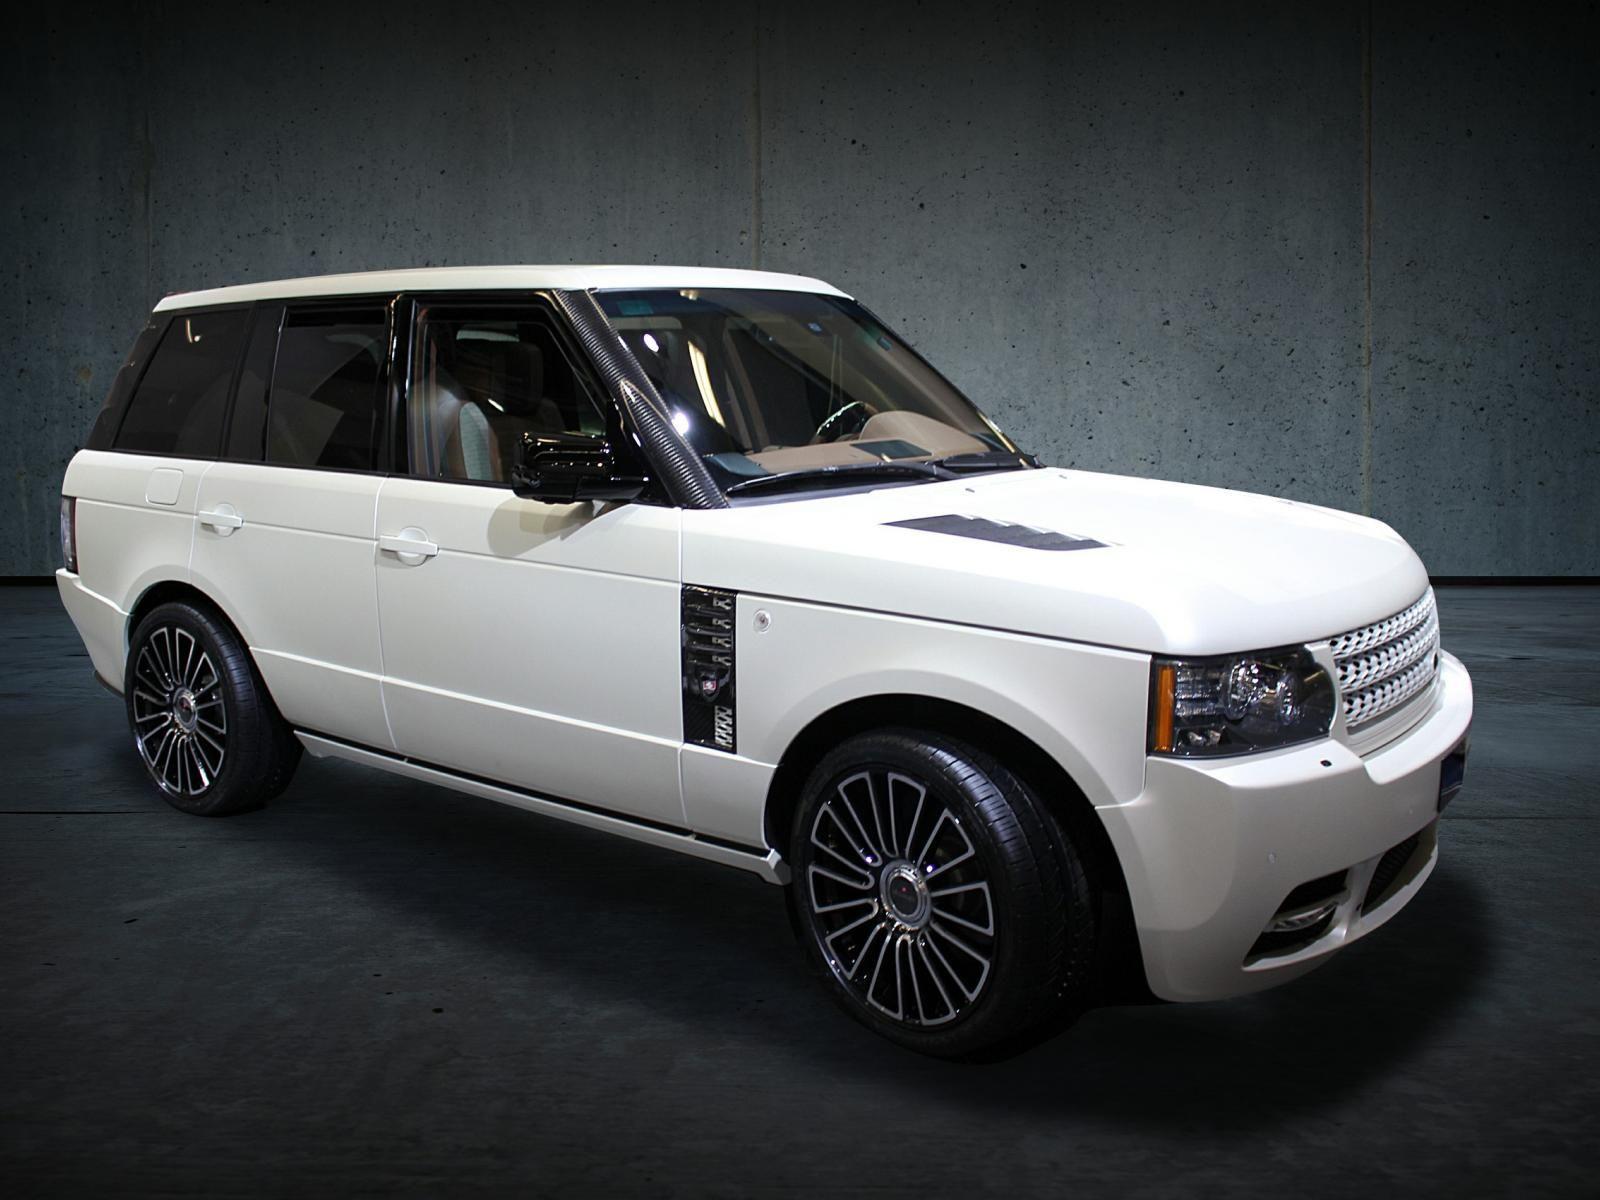 2011 Mansory Range Rover Vogue Range rover, Range rover